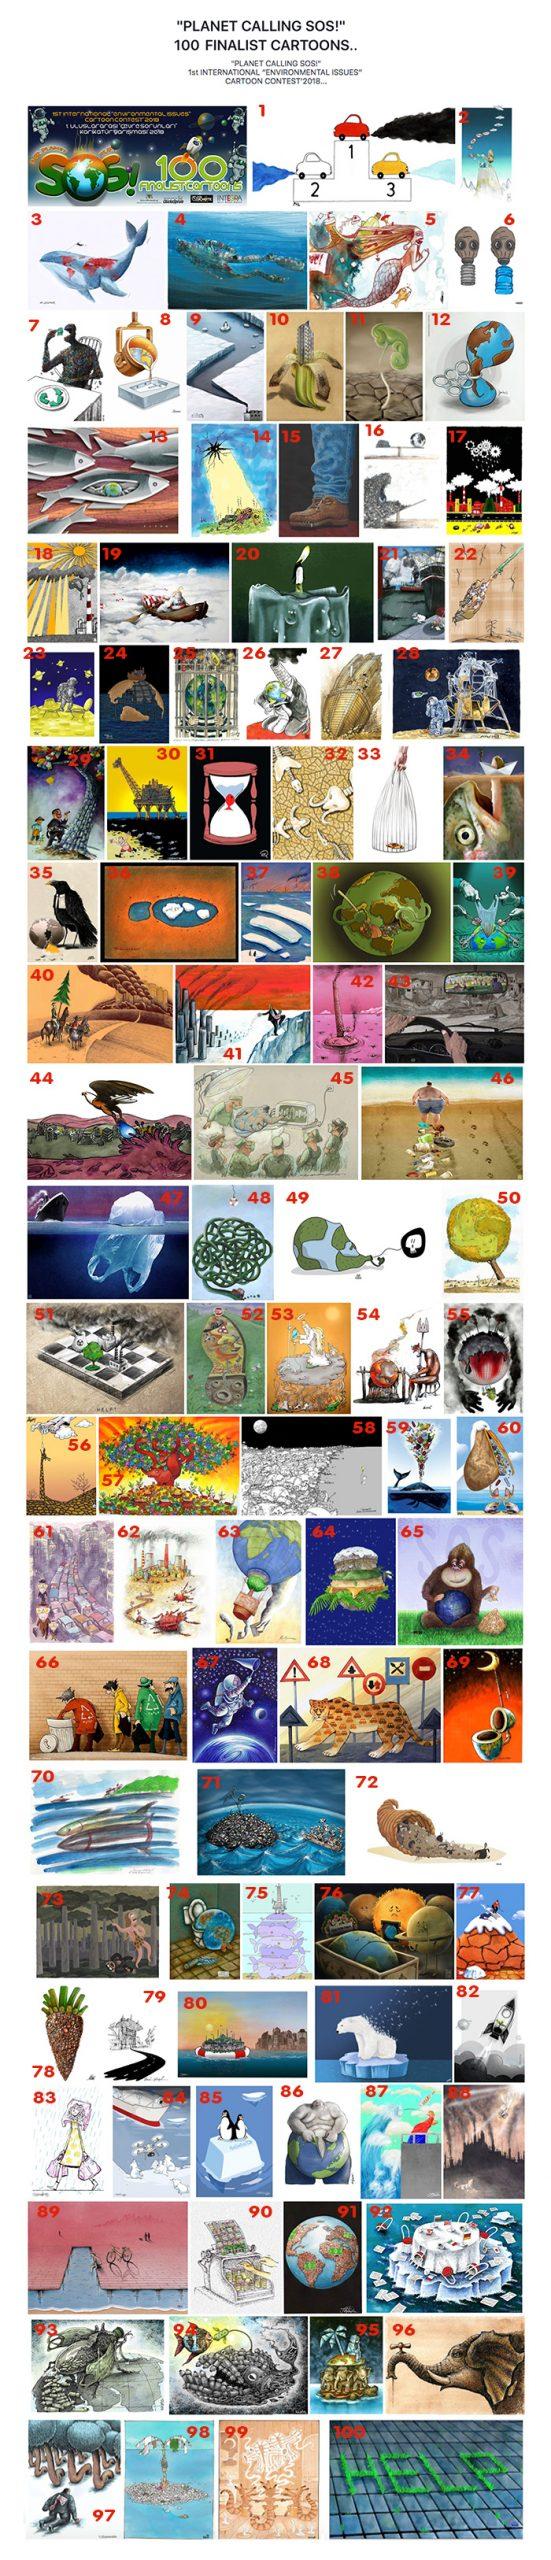 100_finalists-dq2.jpg